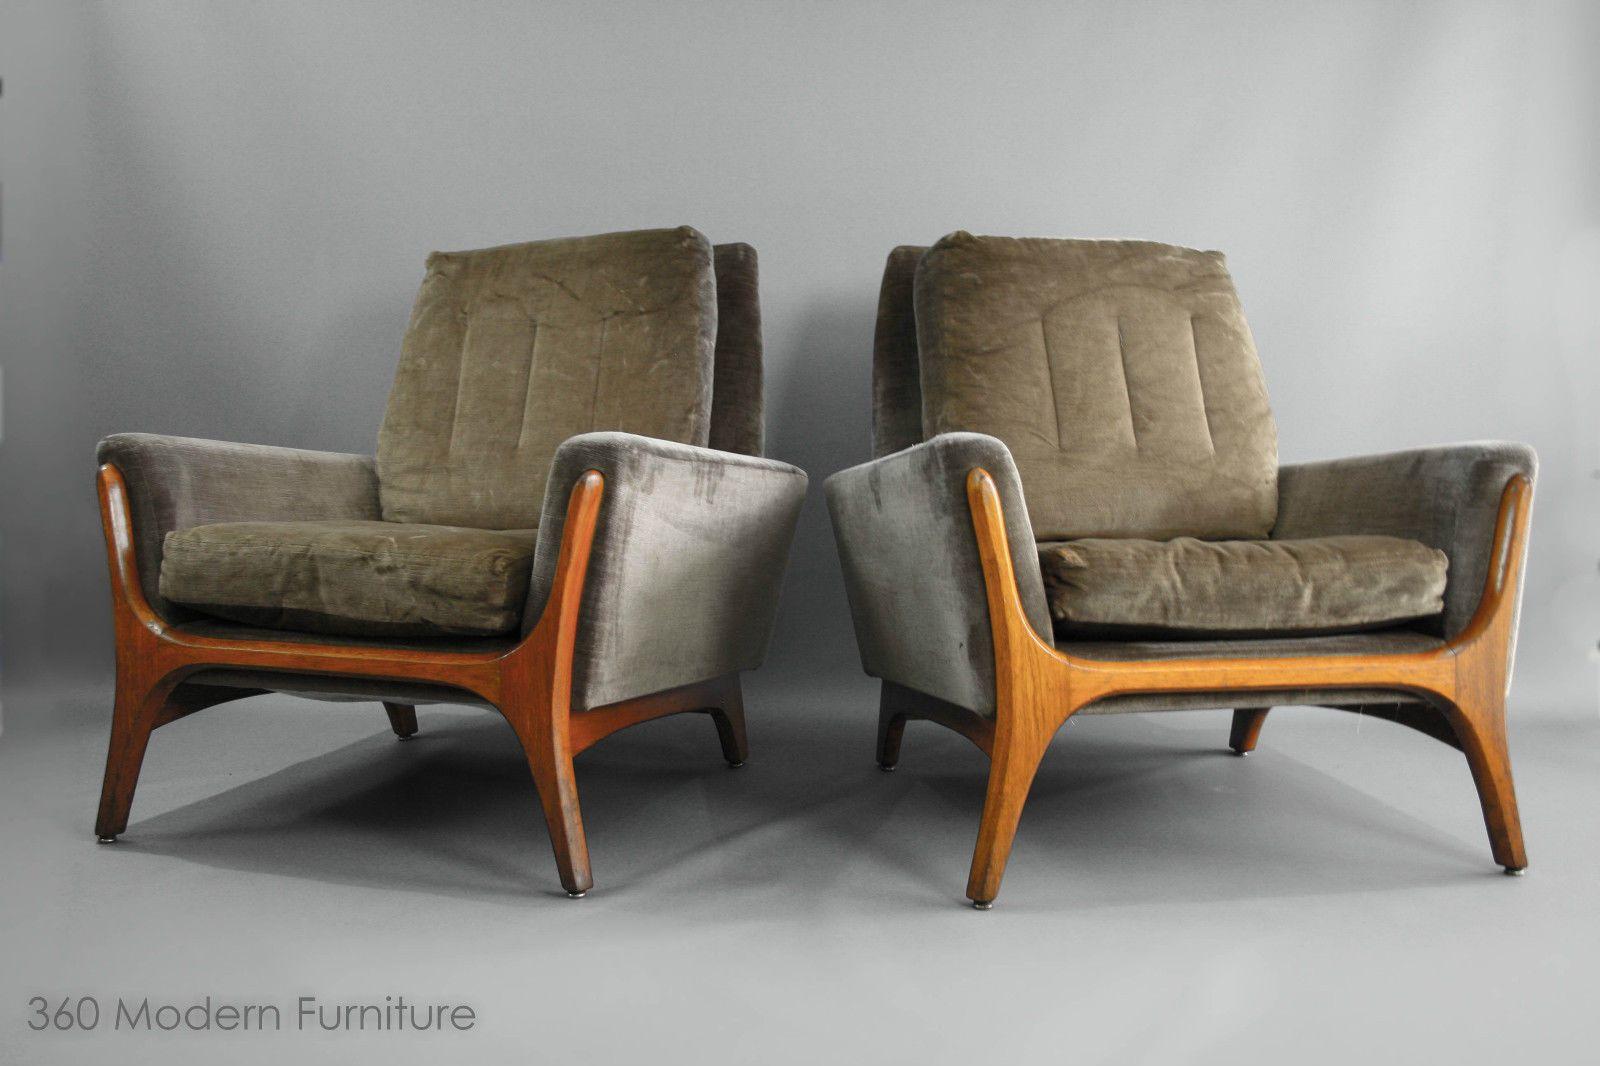 Danish Style Sofa Australia Beds At Dreams Mid Century Modern Armchairs X 2 Teak Retro Vintage Lounge